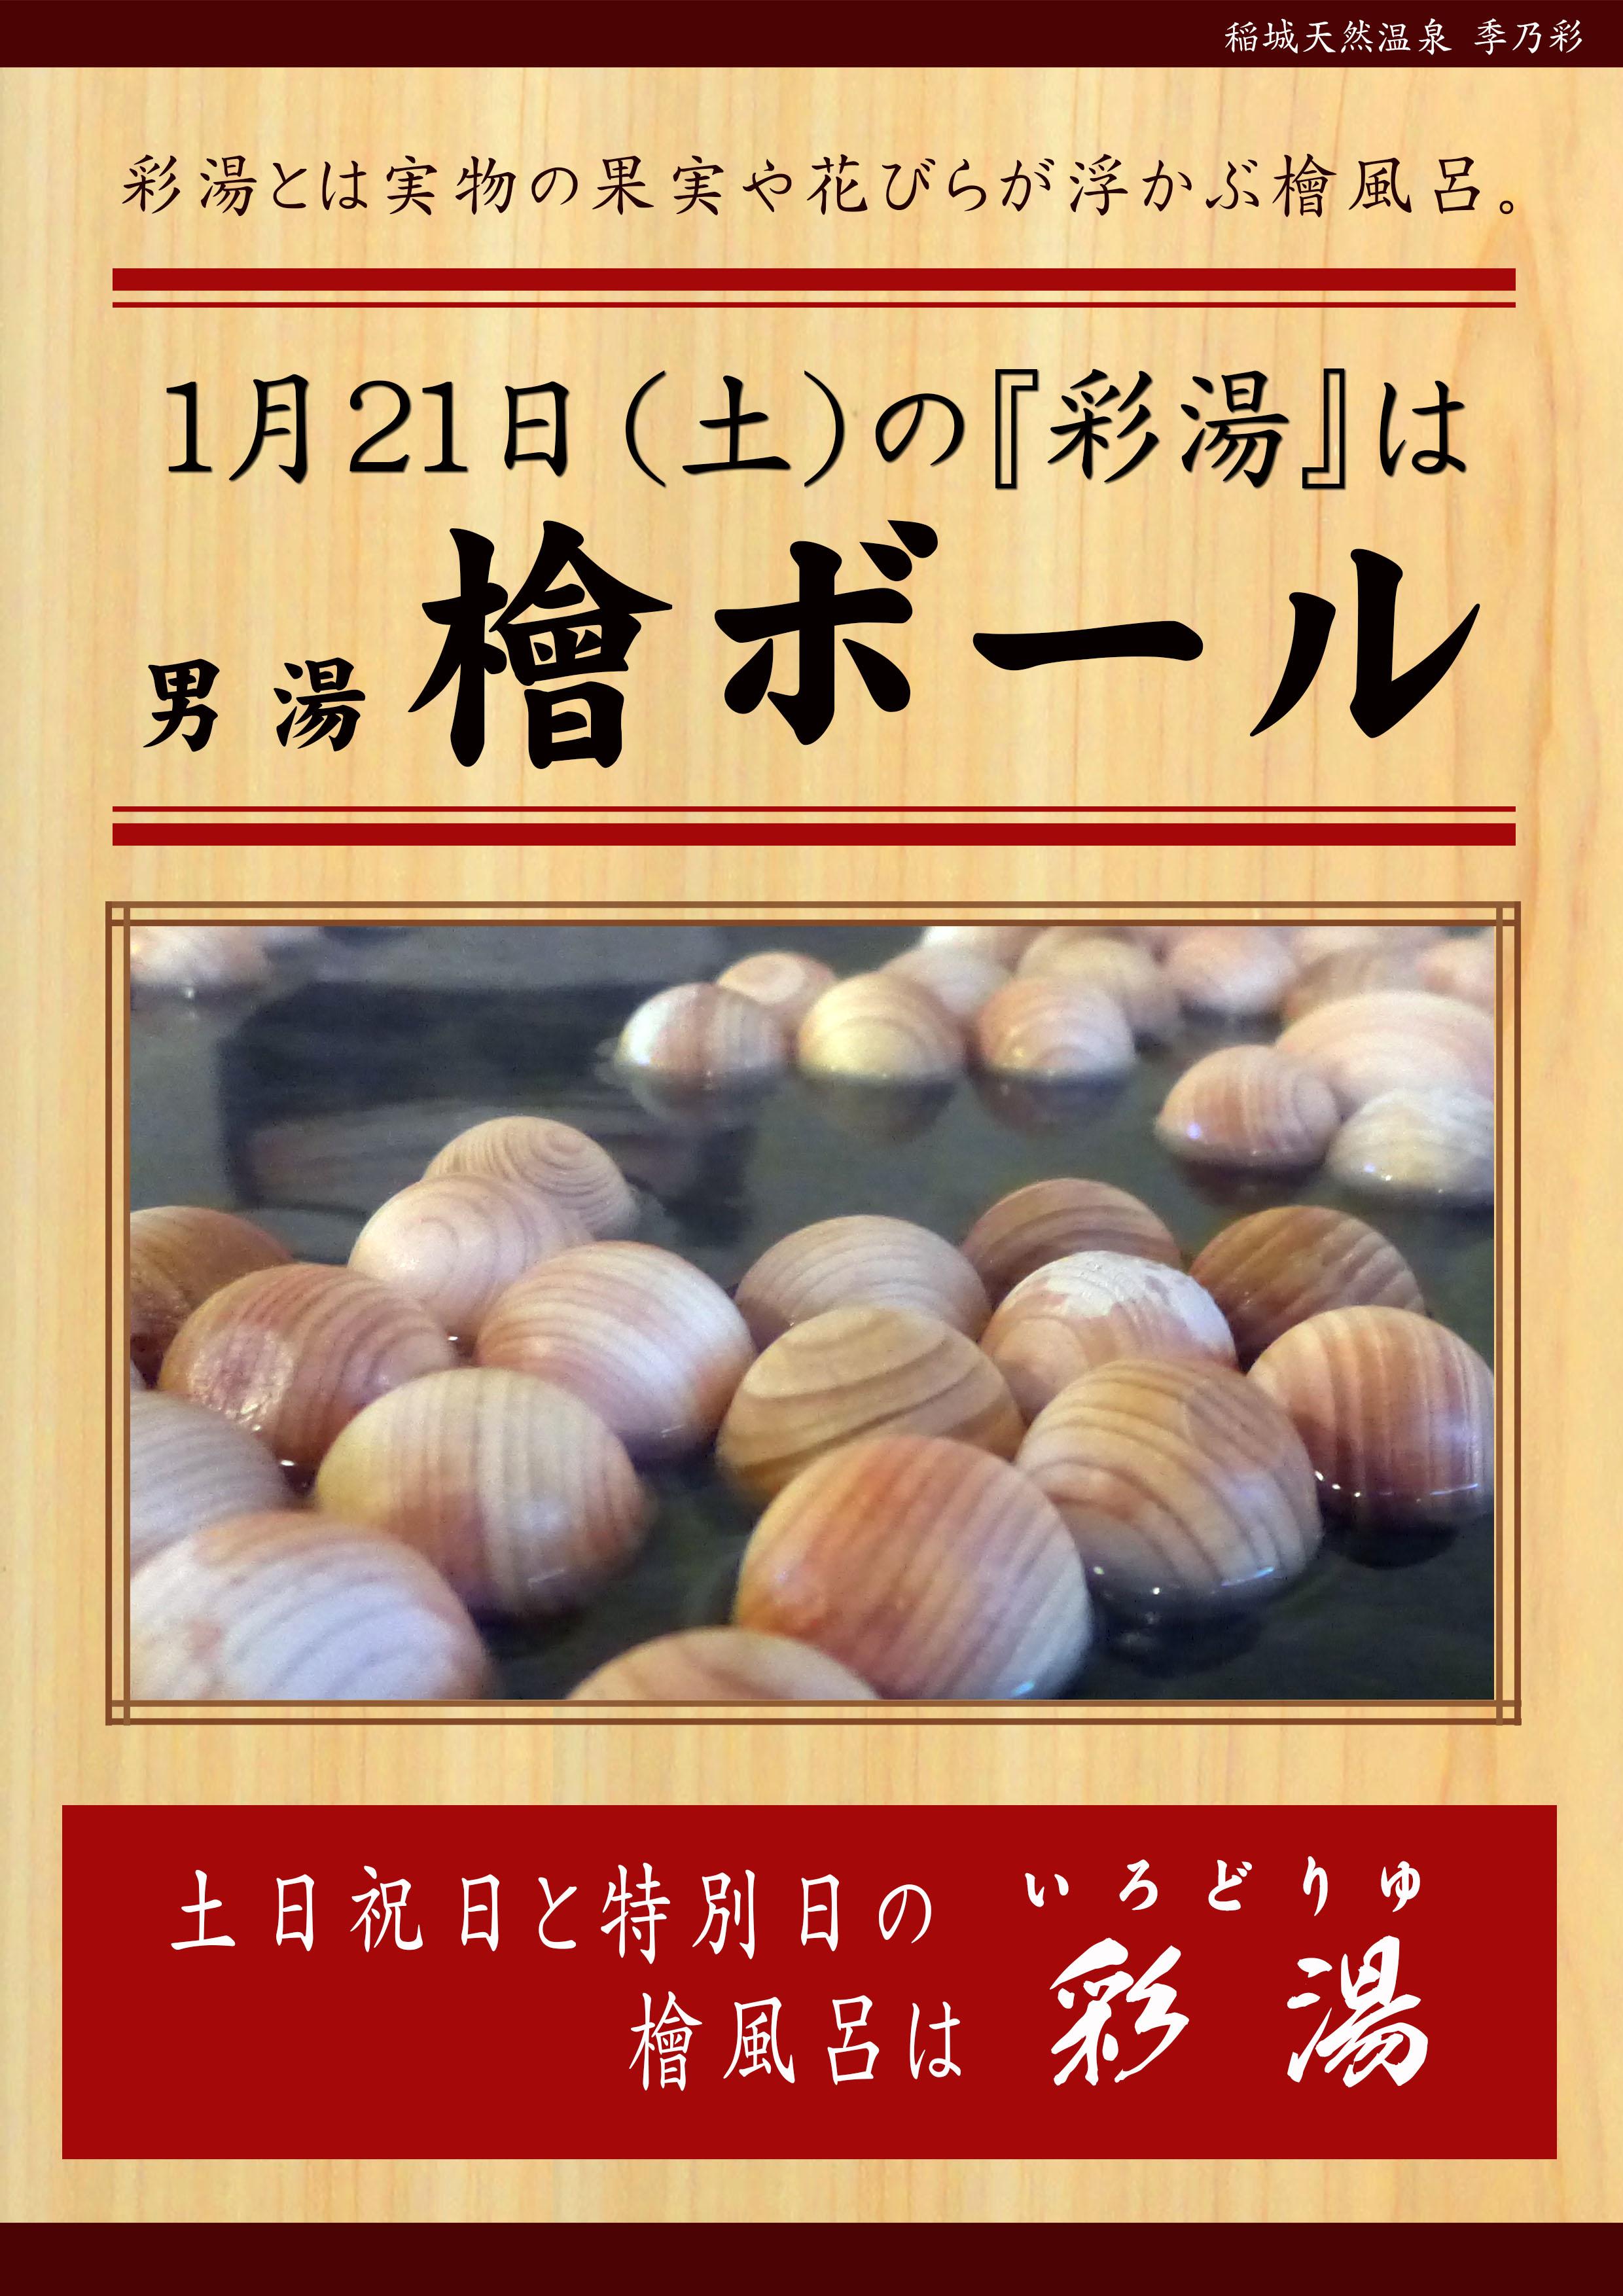 20170121POP イベント 彩湯 男湯 檜ボール